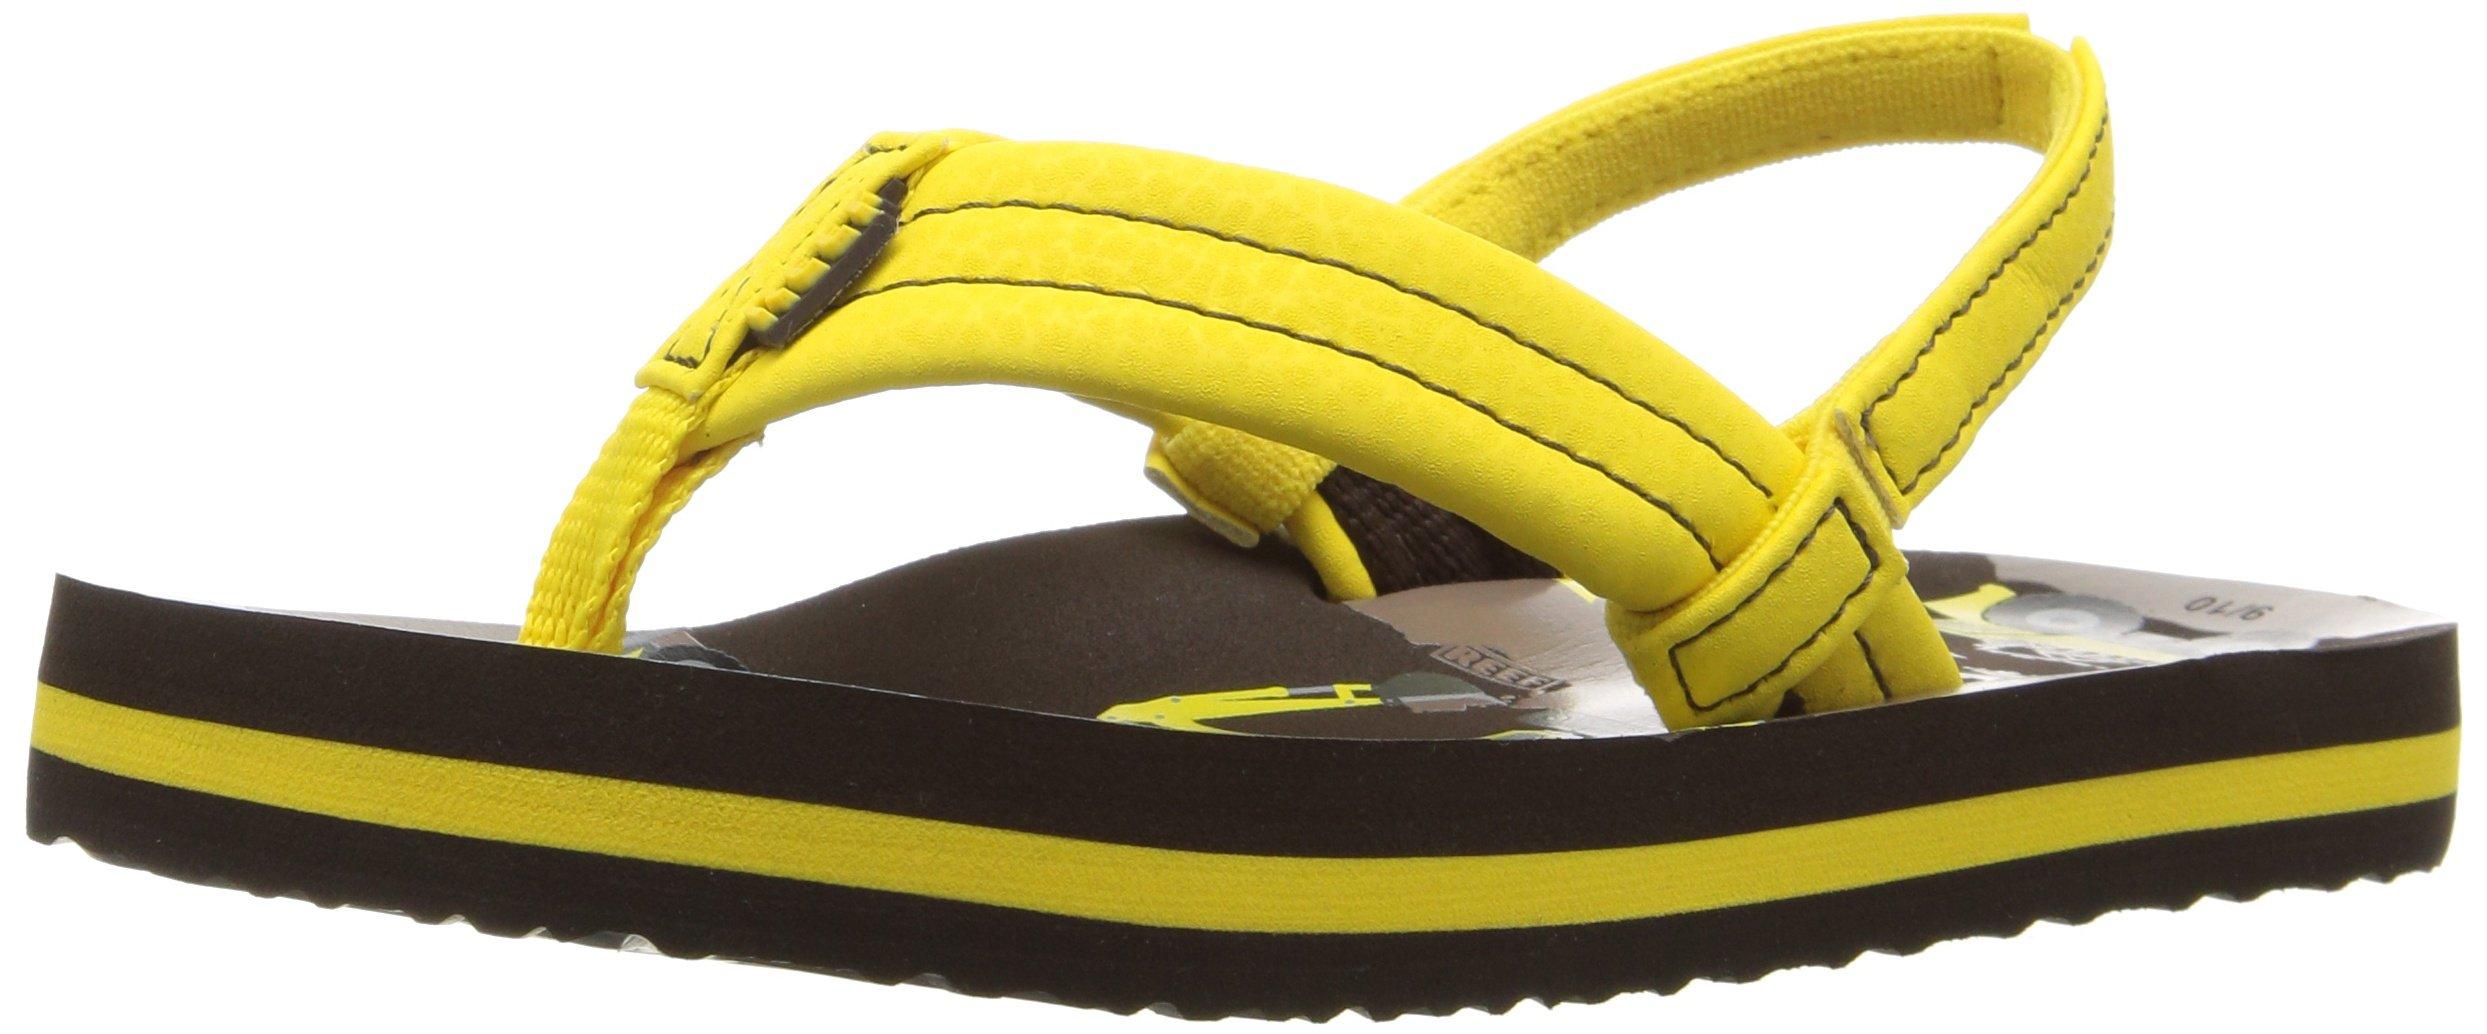 Reef Boys' Ahi Sandal, Yellow Trucks, 6-7 M US Big Kid